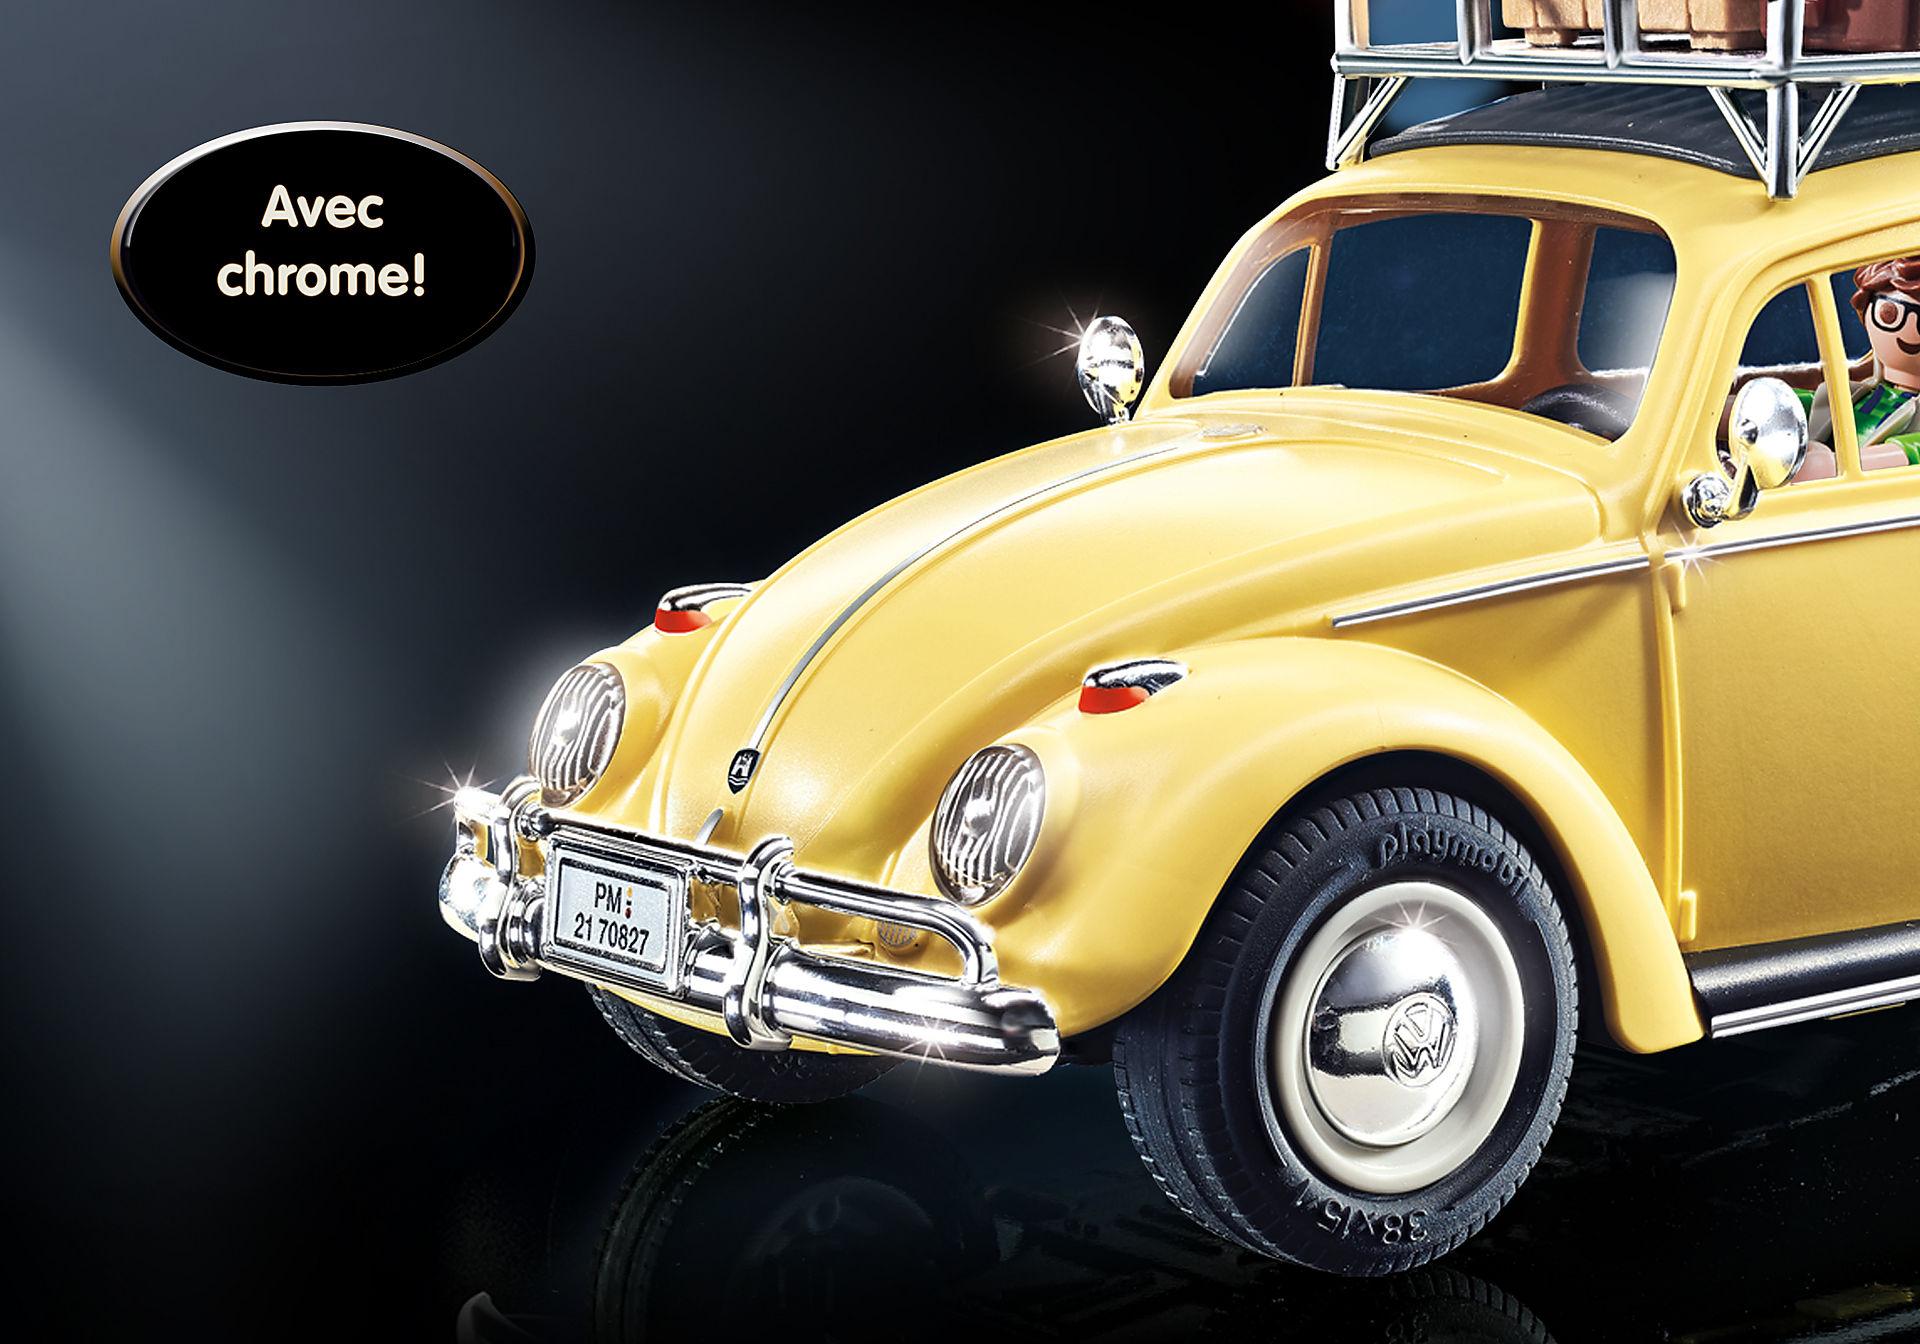 70827 Volkswagen Coccinelle - Edition spéciale zoom image5